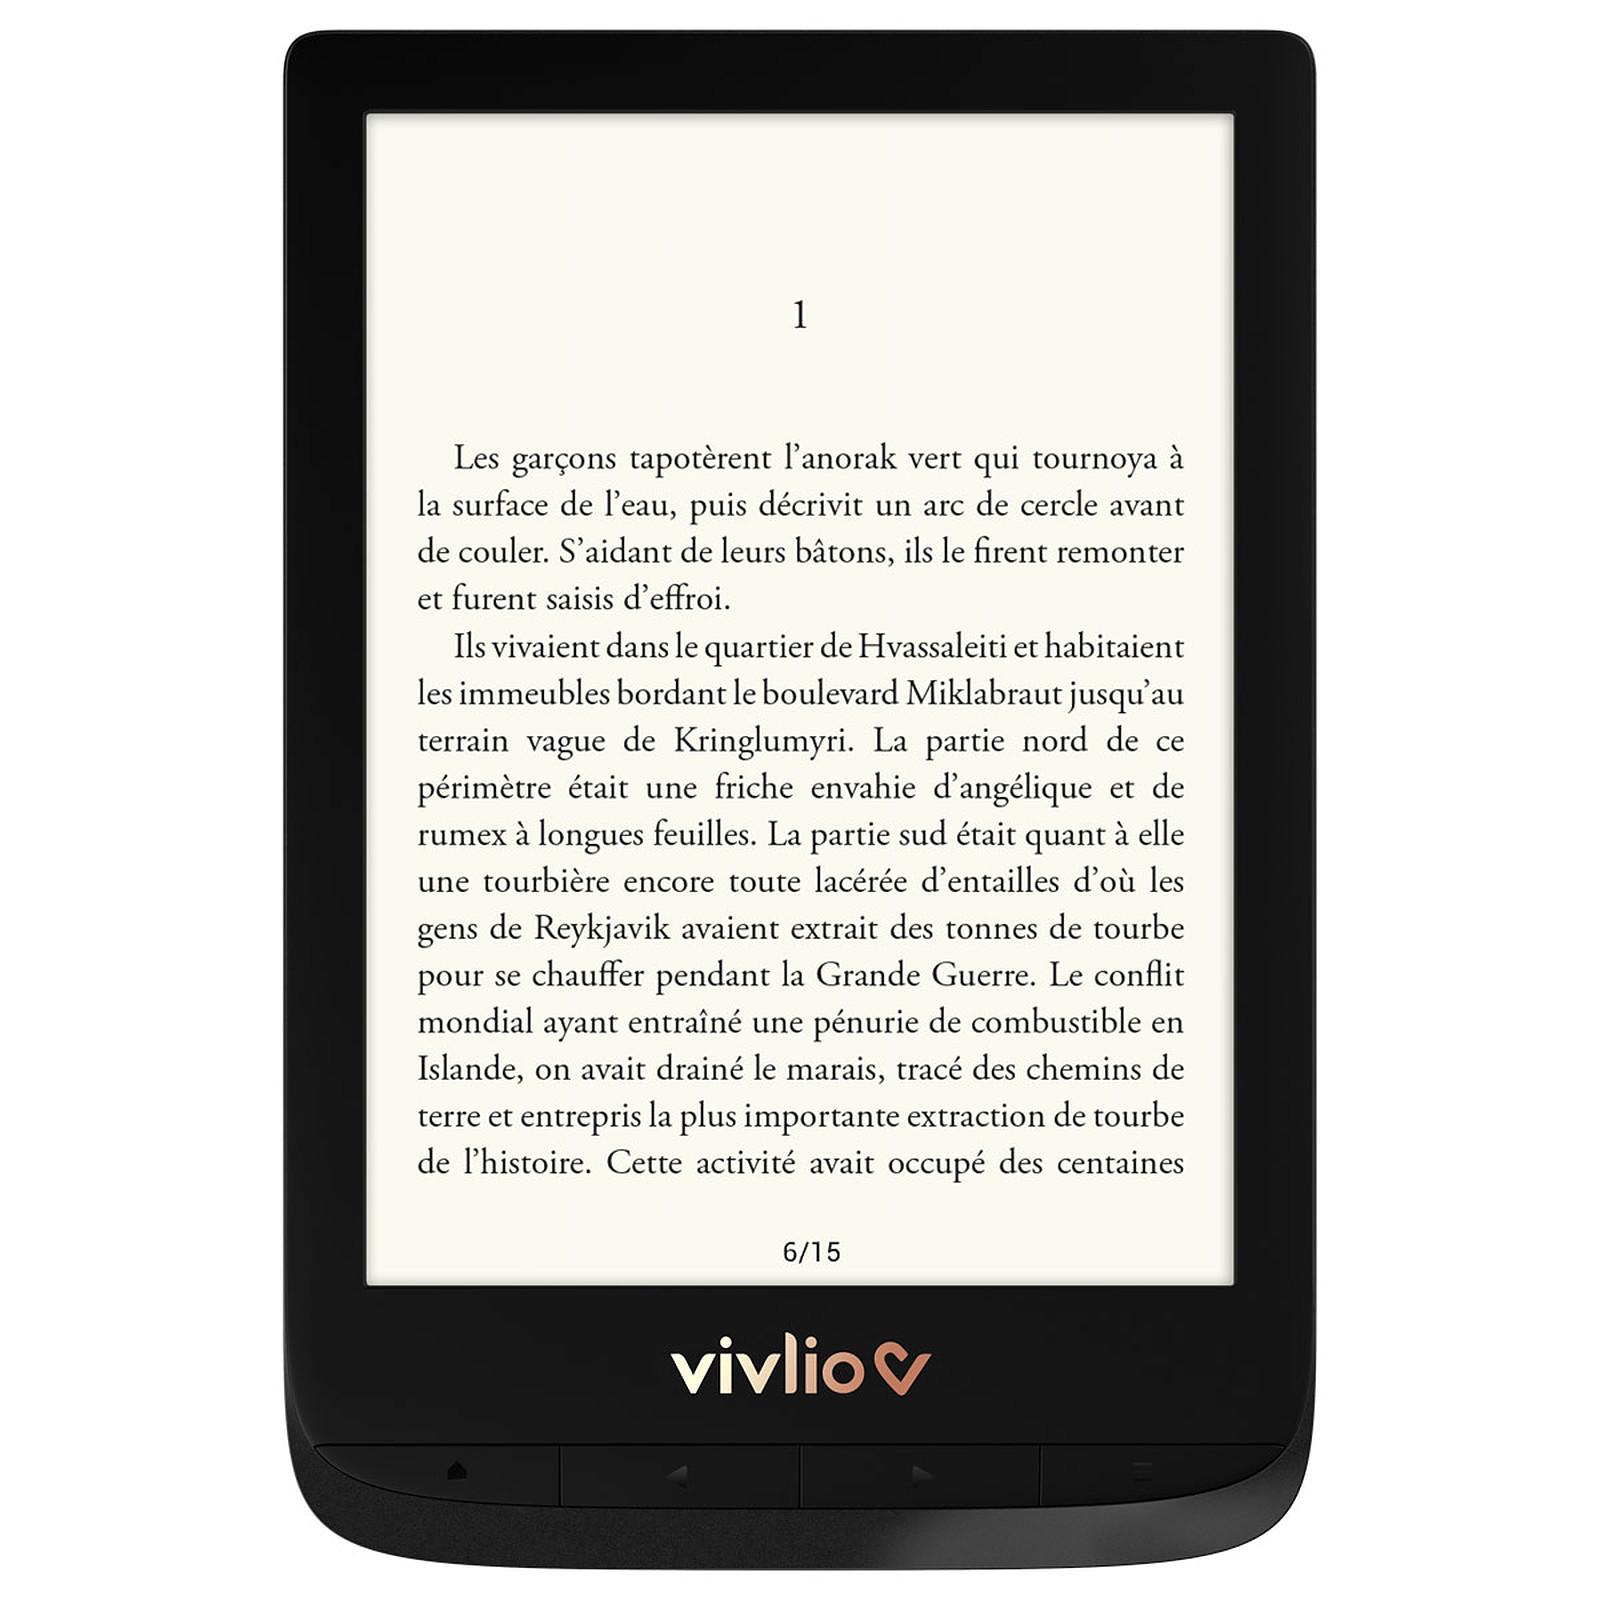 Vivlio Touch Lux 4 Noir + Pack d'eBooks OFFERT